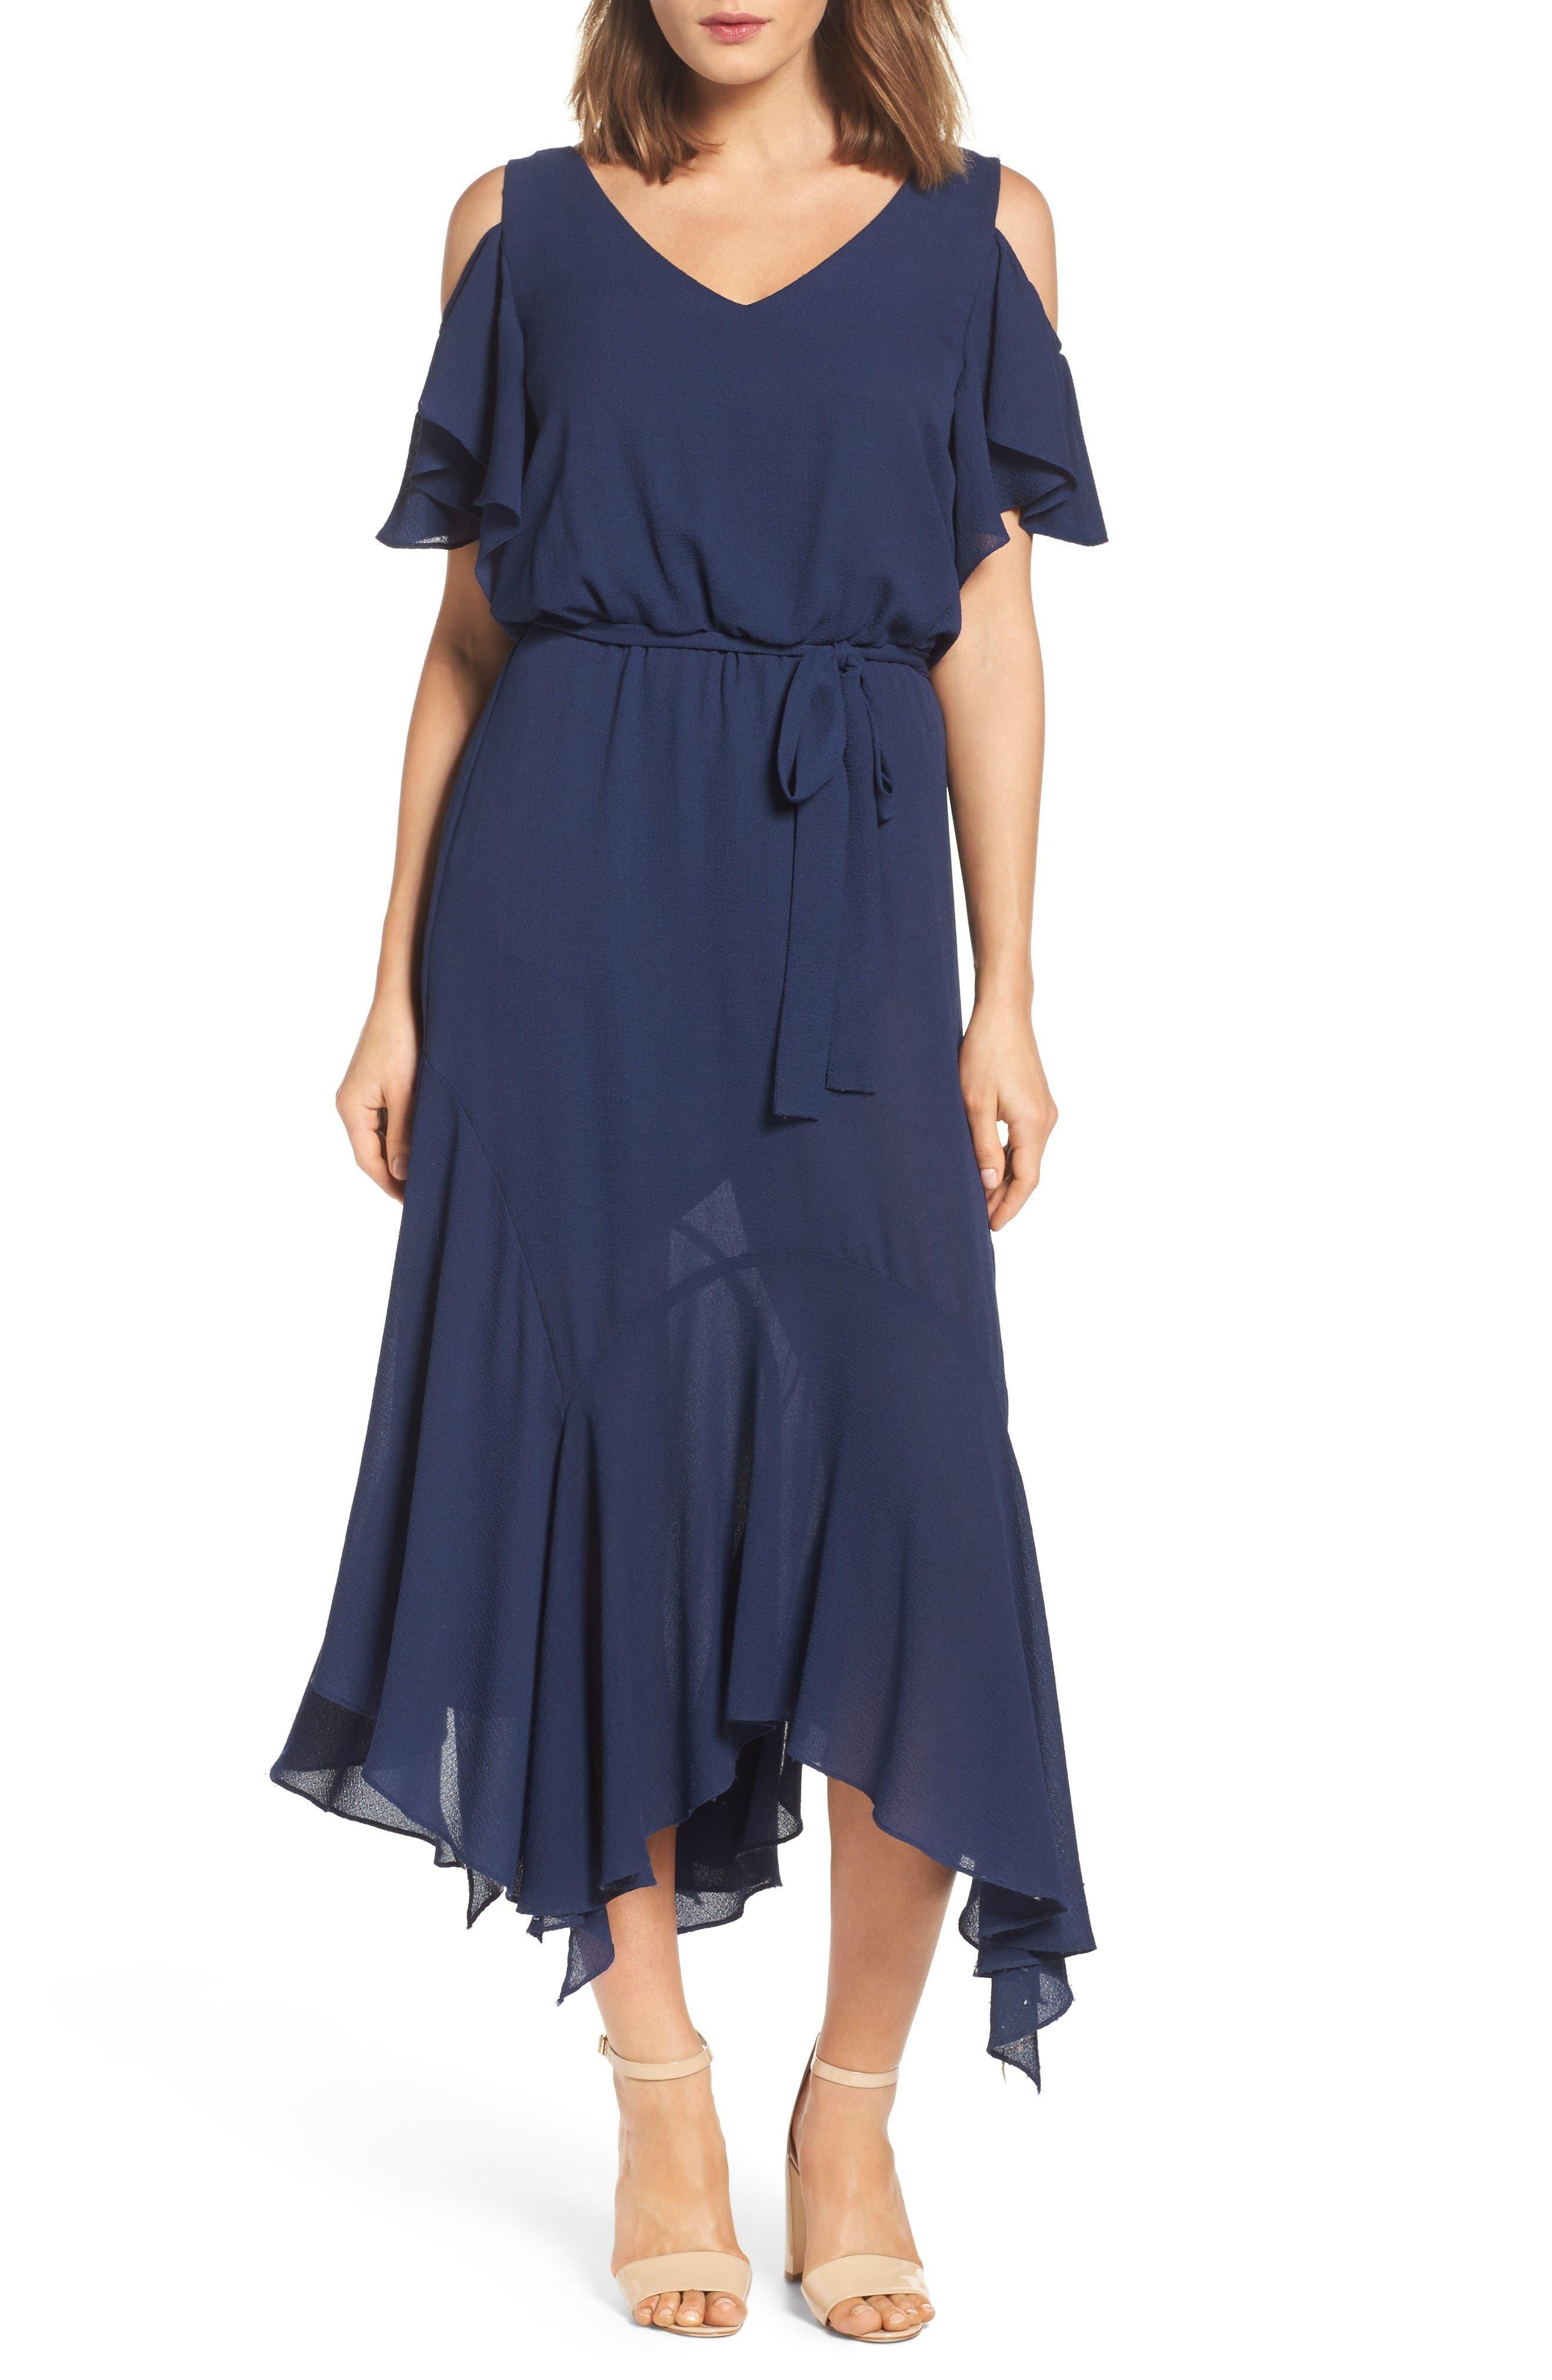 Alternate Image 1 Selected - Maggy London Cold Shoulder Midi Dress (Regular & Petite)